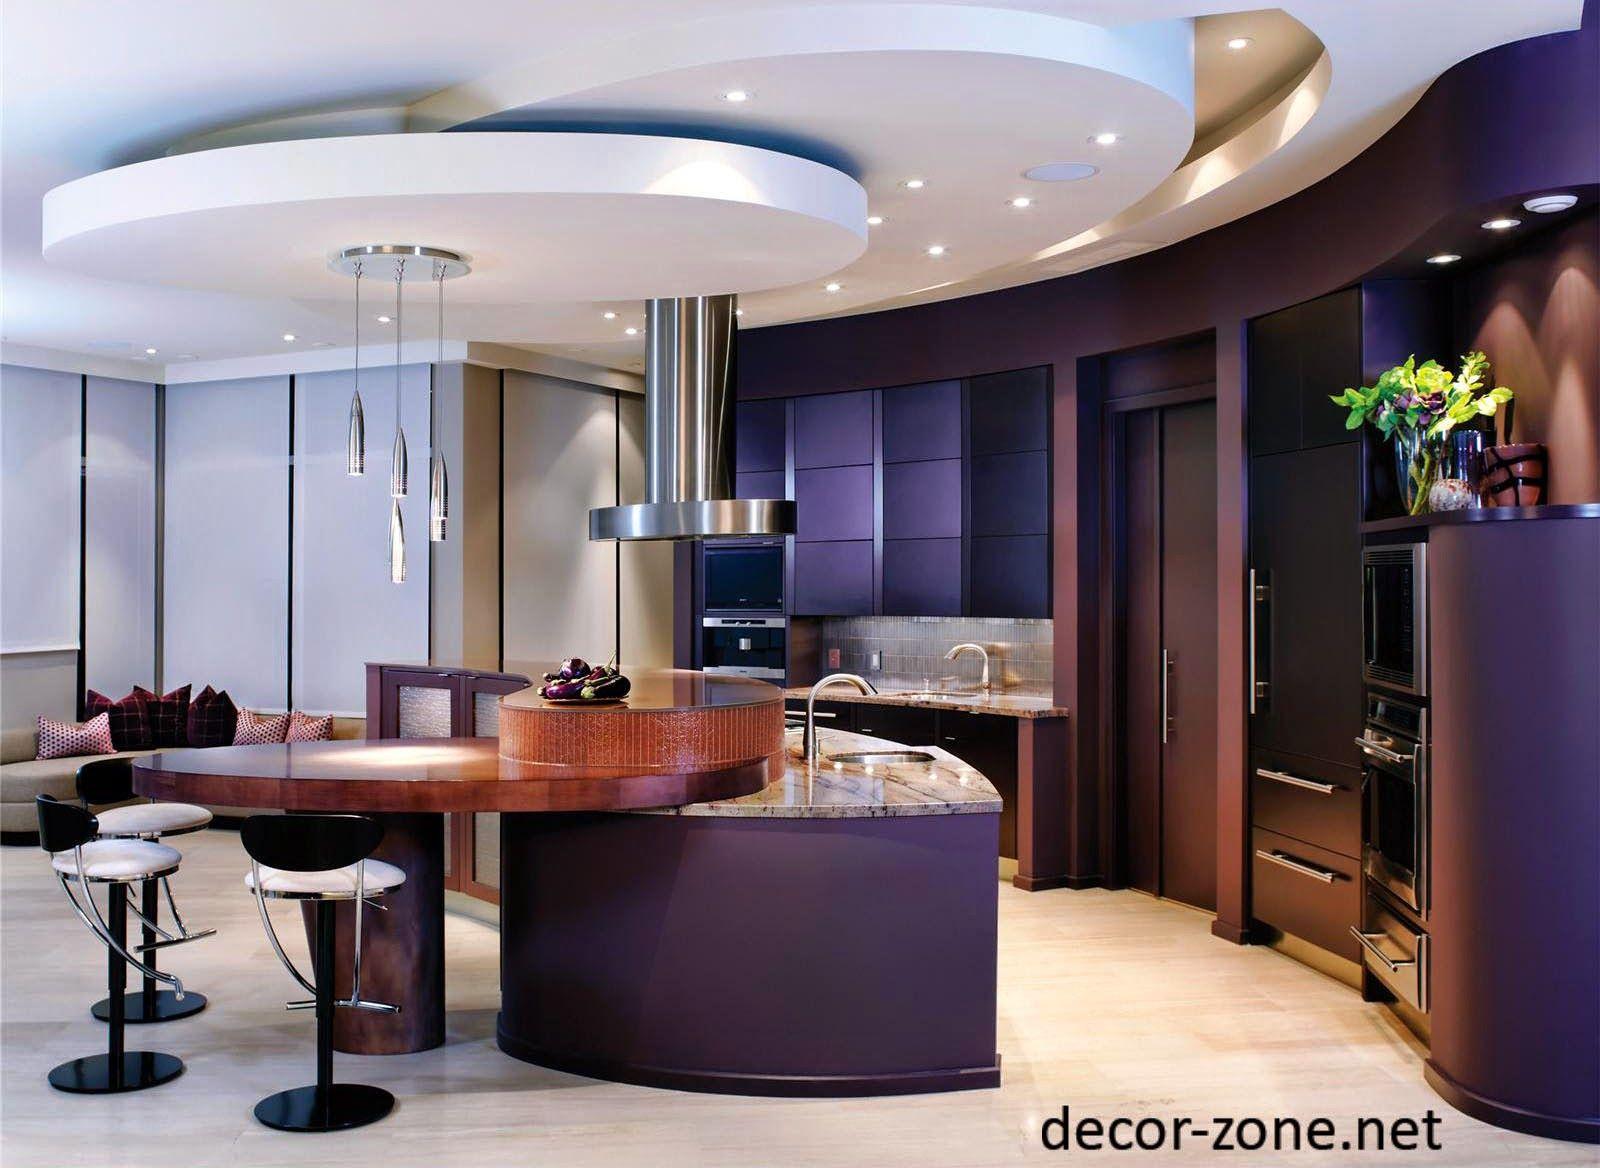 kitchen ceiling ideas, gypsum false ceiling designs | Futuristic ...